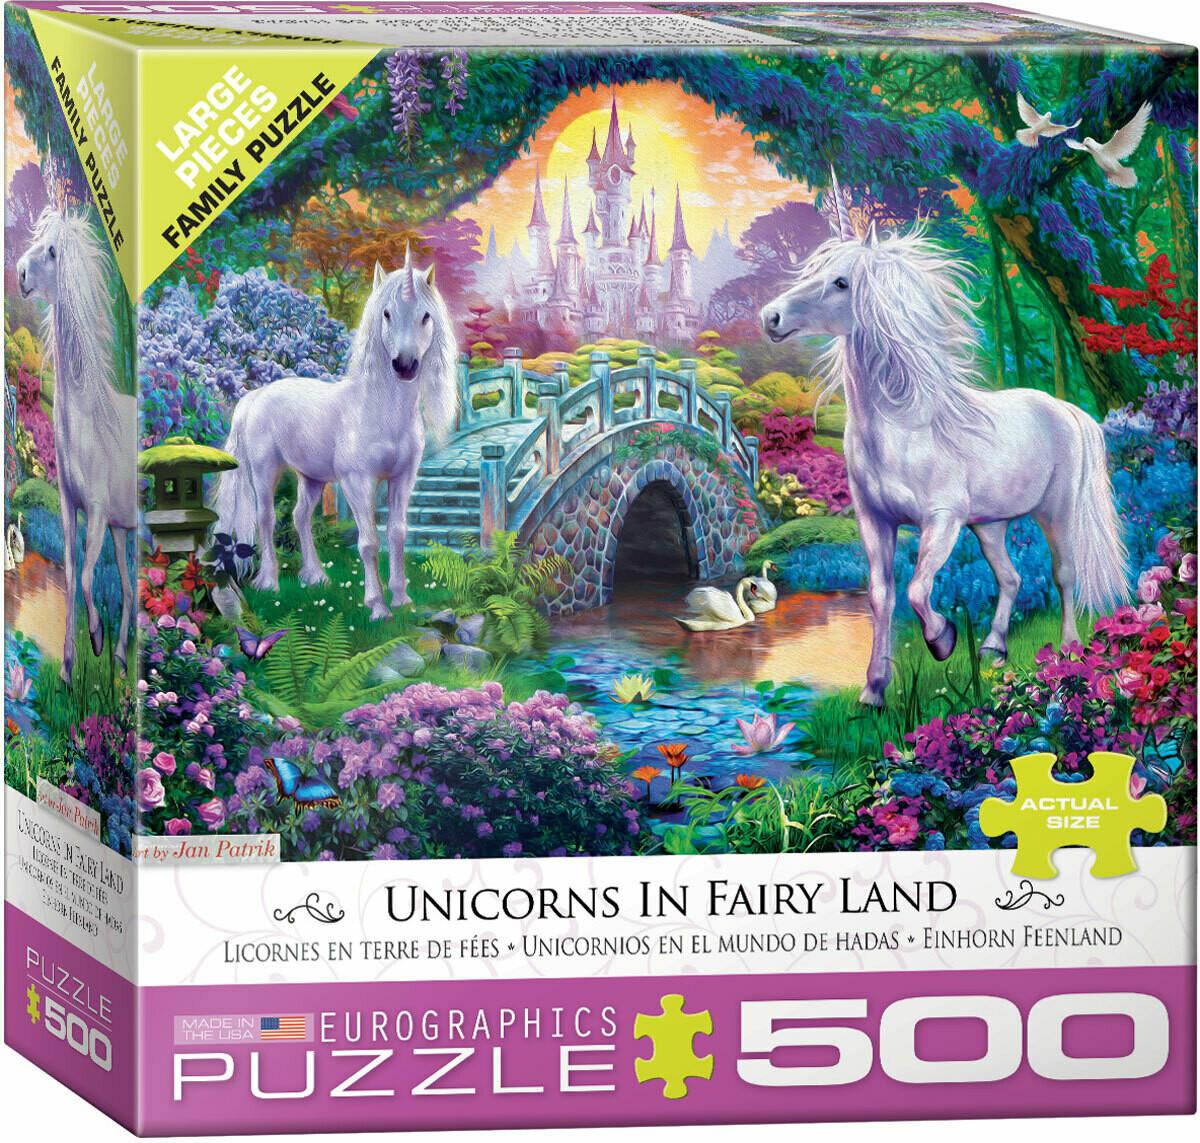 Unicorns in Fairy Land